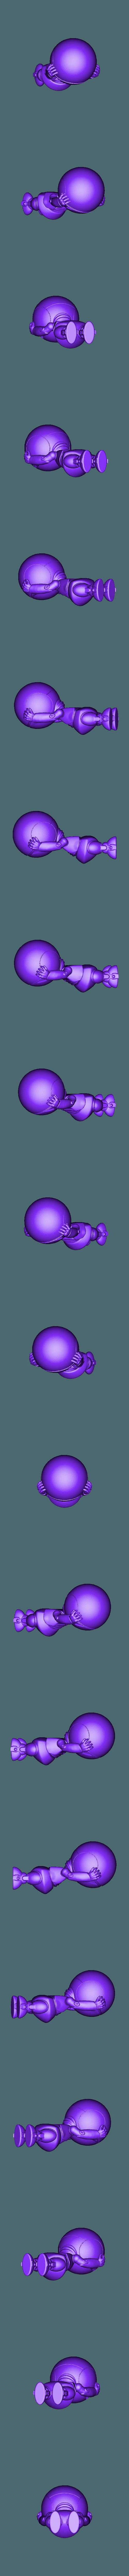 marvin-2.stl Download free STL file Marvin posing • Design to 3D print, firebird